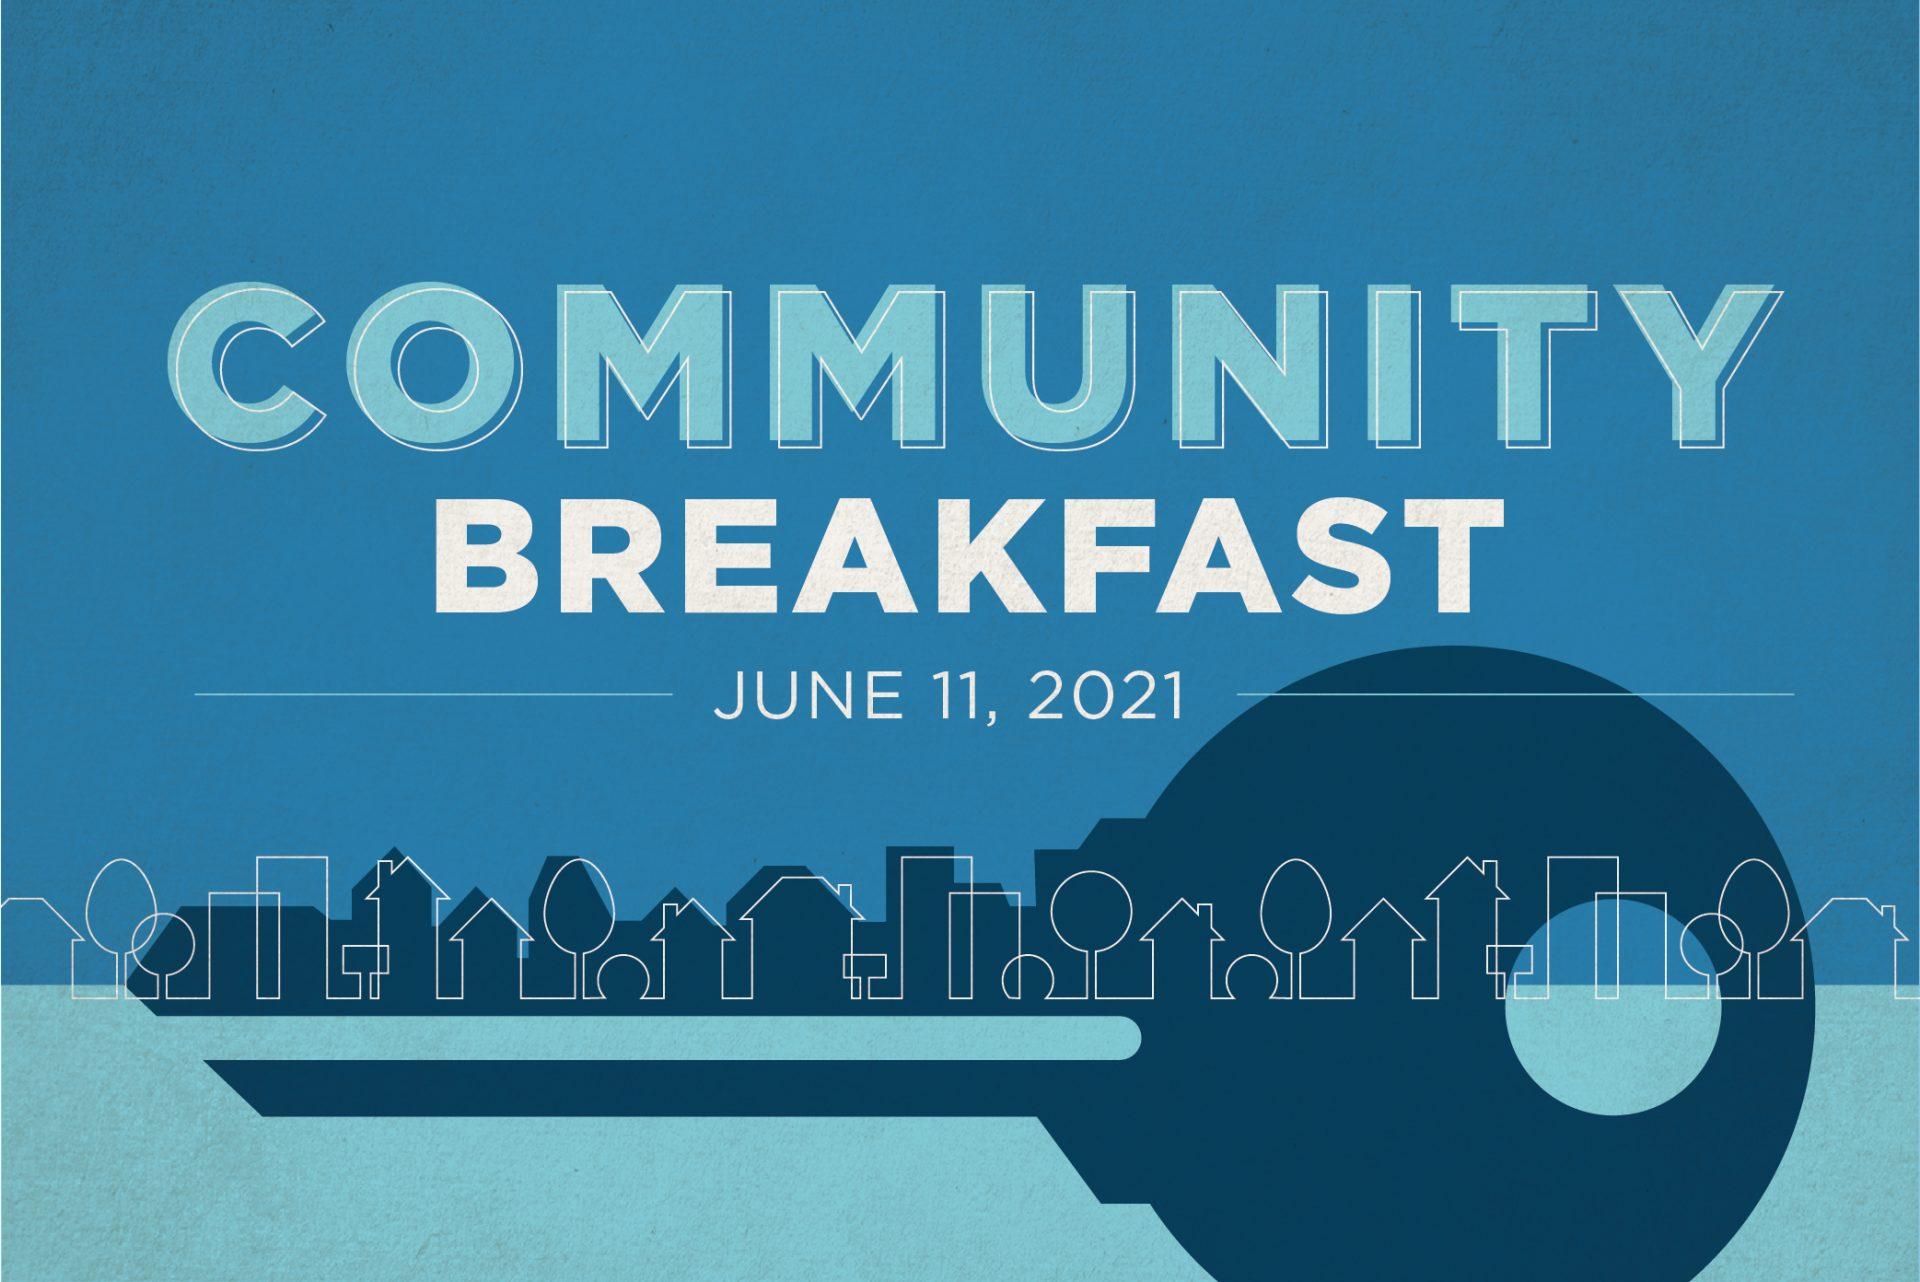 CommunityBreakfast2021_WebsiteGraphic